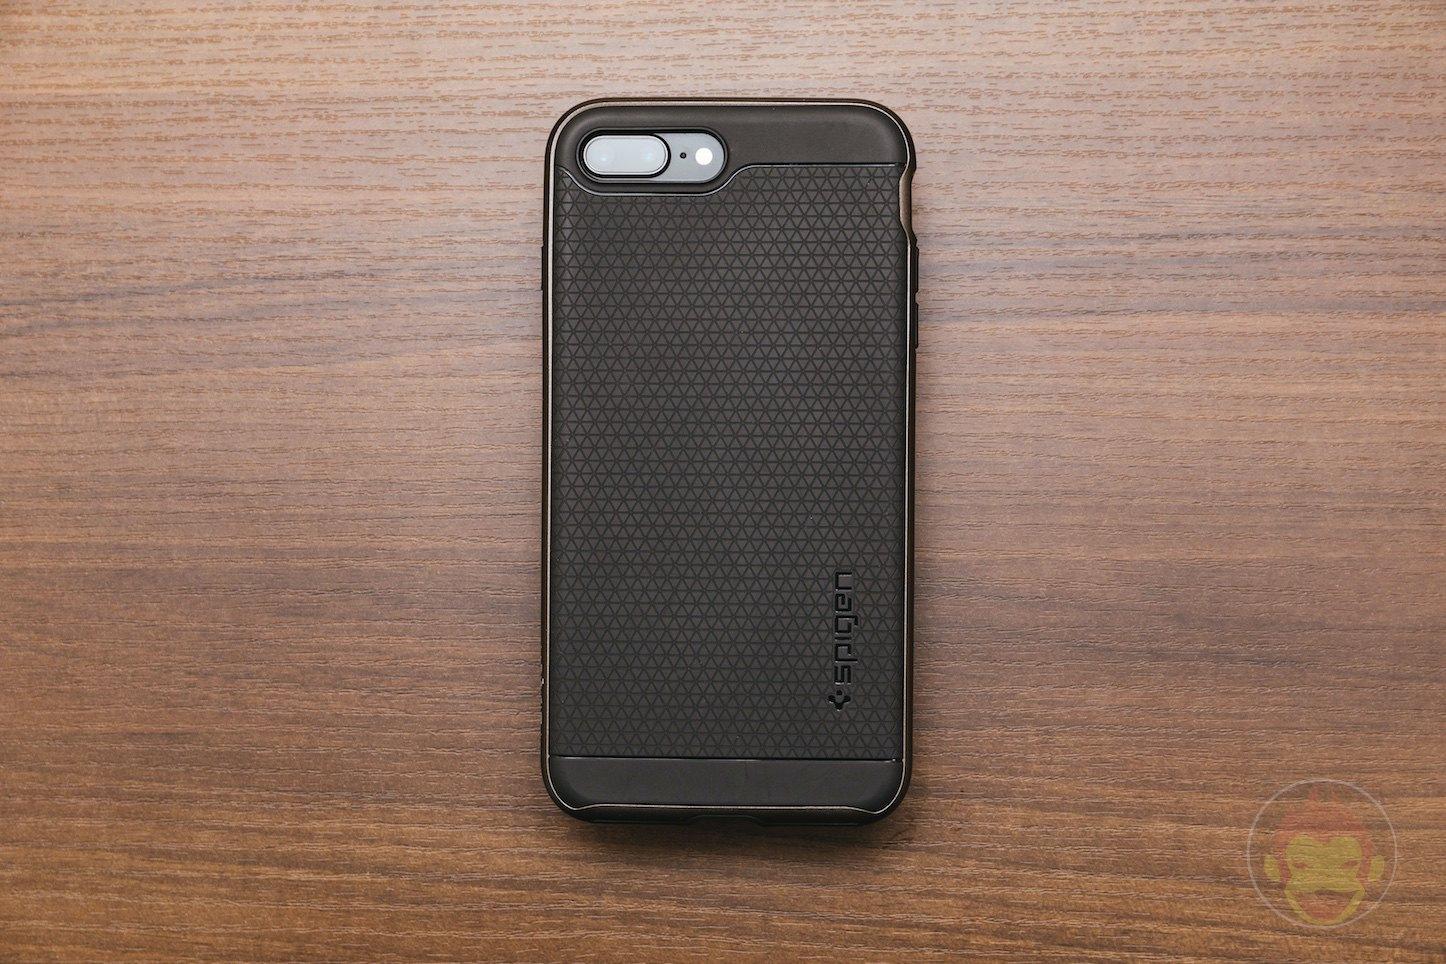 Spigen-Neo-Hybird-2-iPHone8Plus-Case-Review-01.jpg